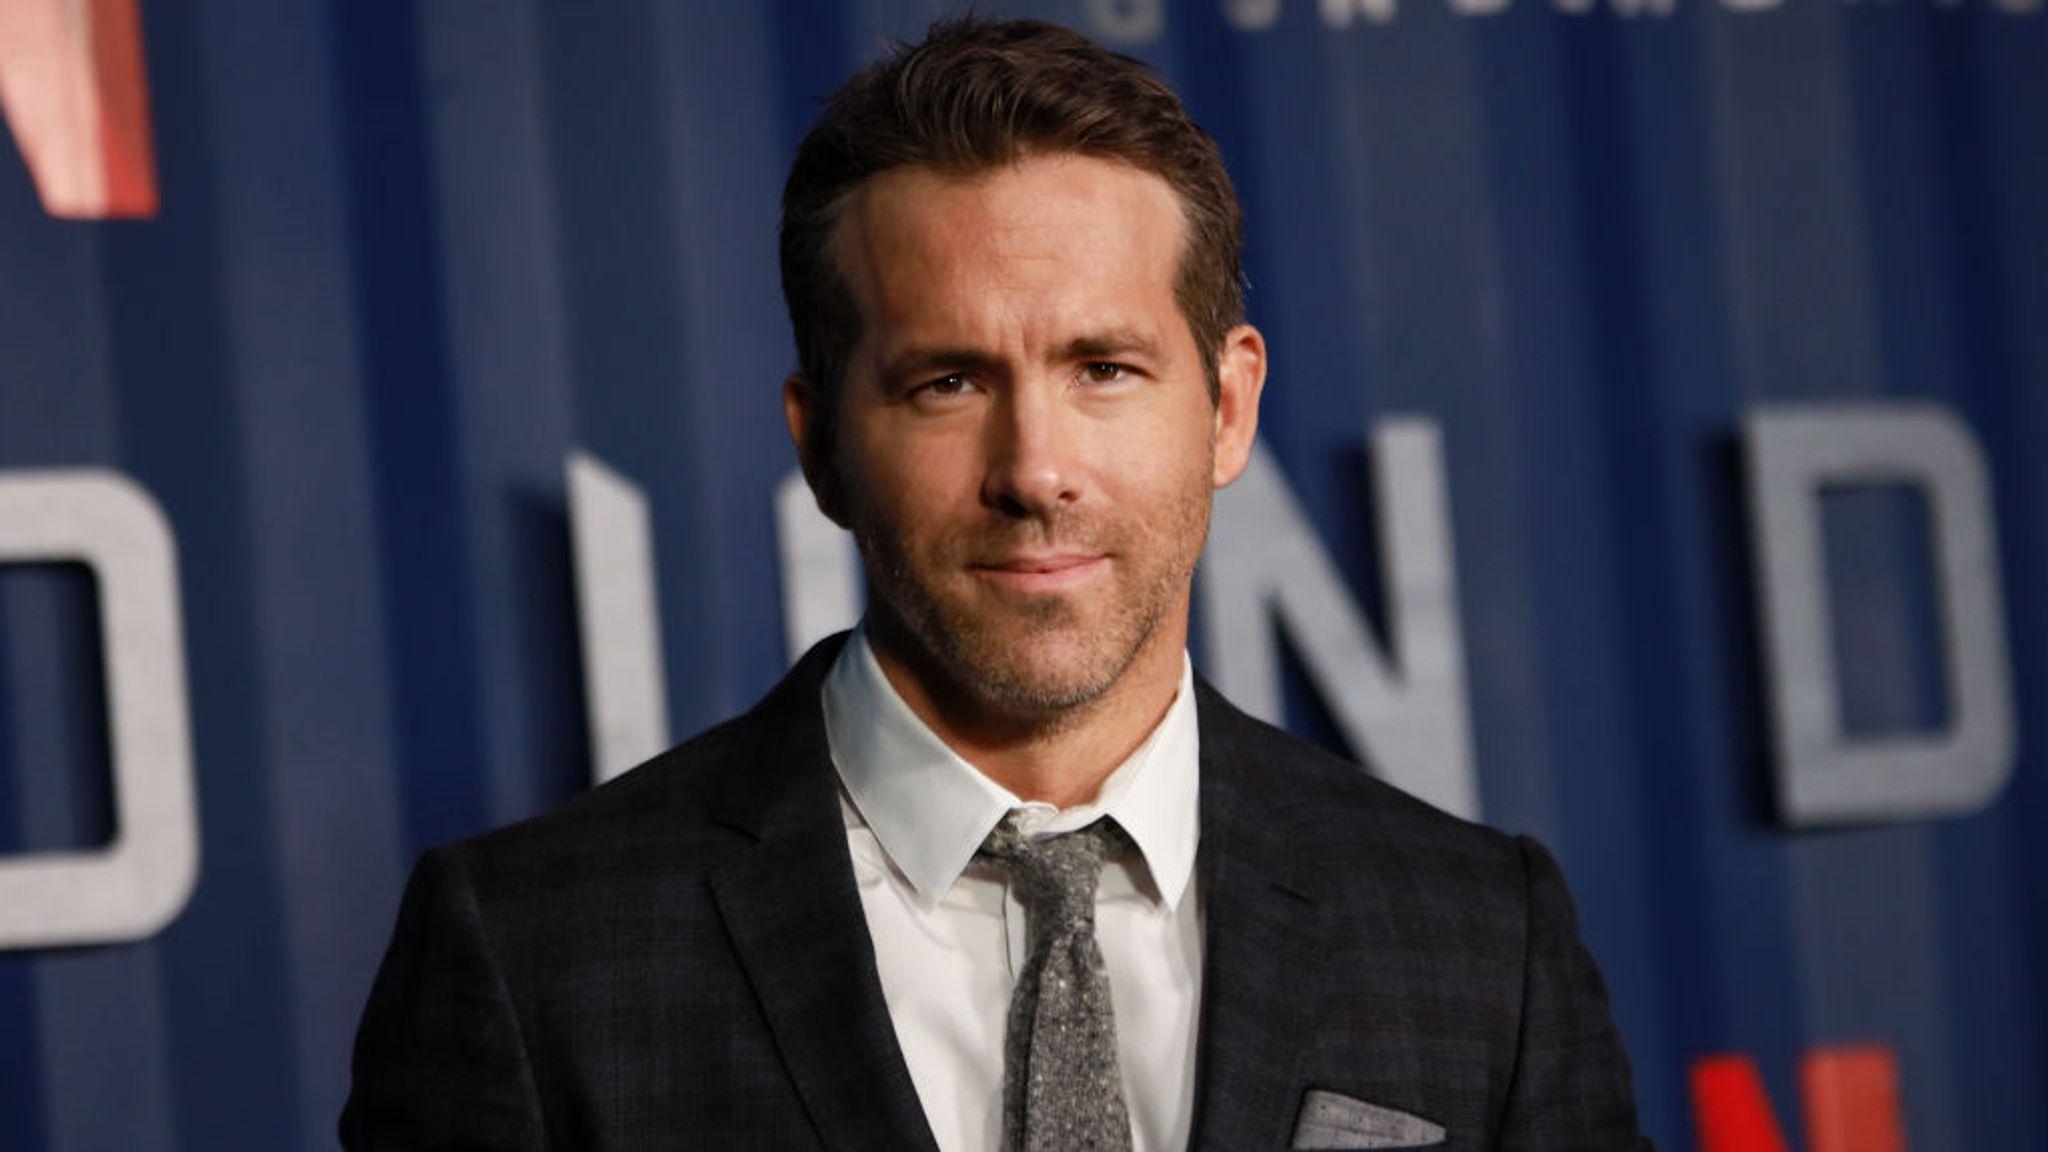 Ryan Reynolds appeared in the 2019 Netflix film Six Underground